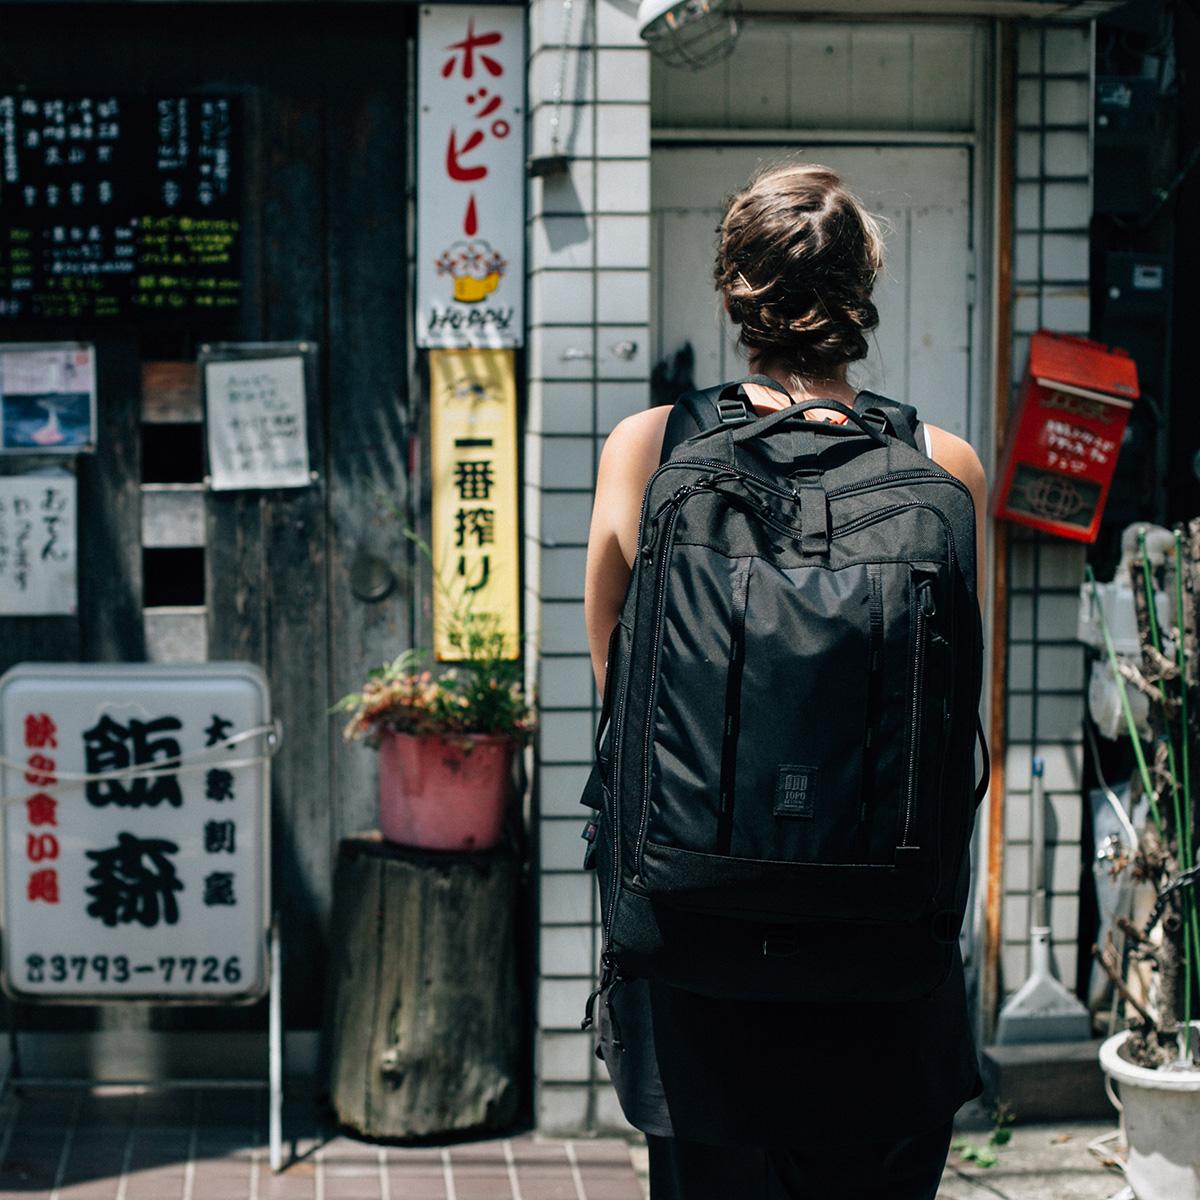 AIRMKT eCom topo black travel 30L bag lifestyle on girl WEB